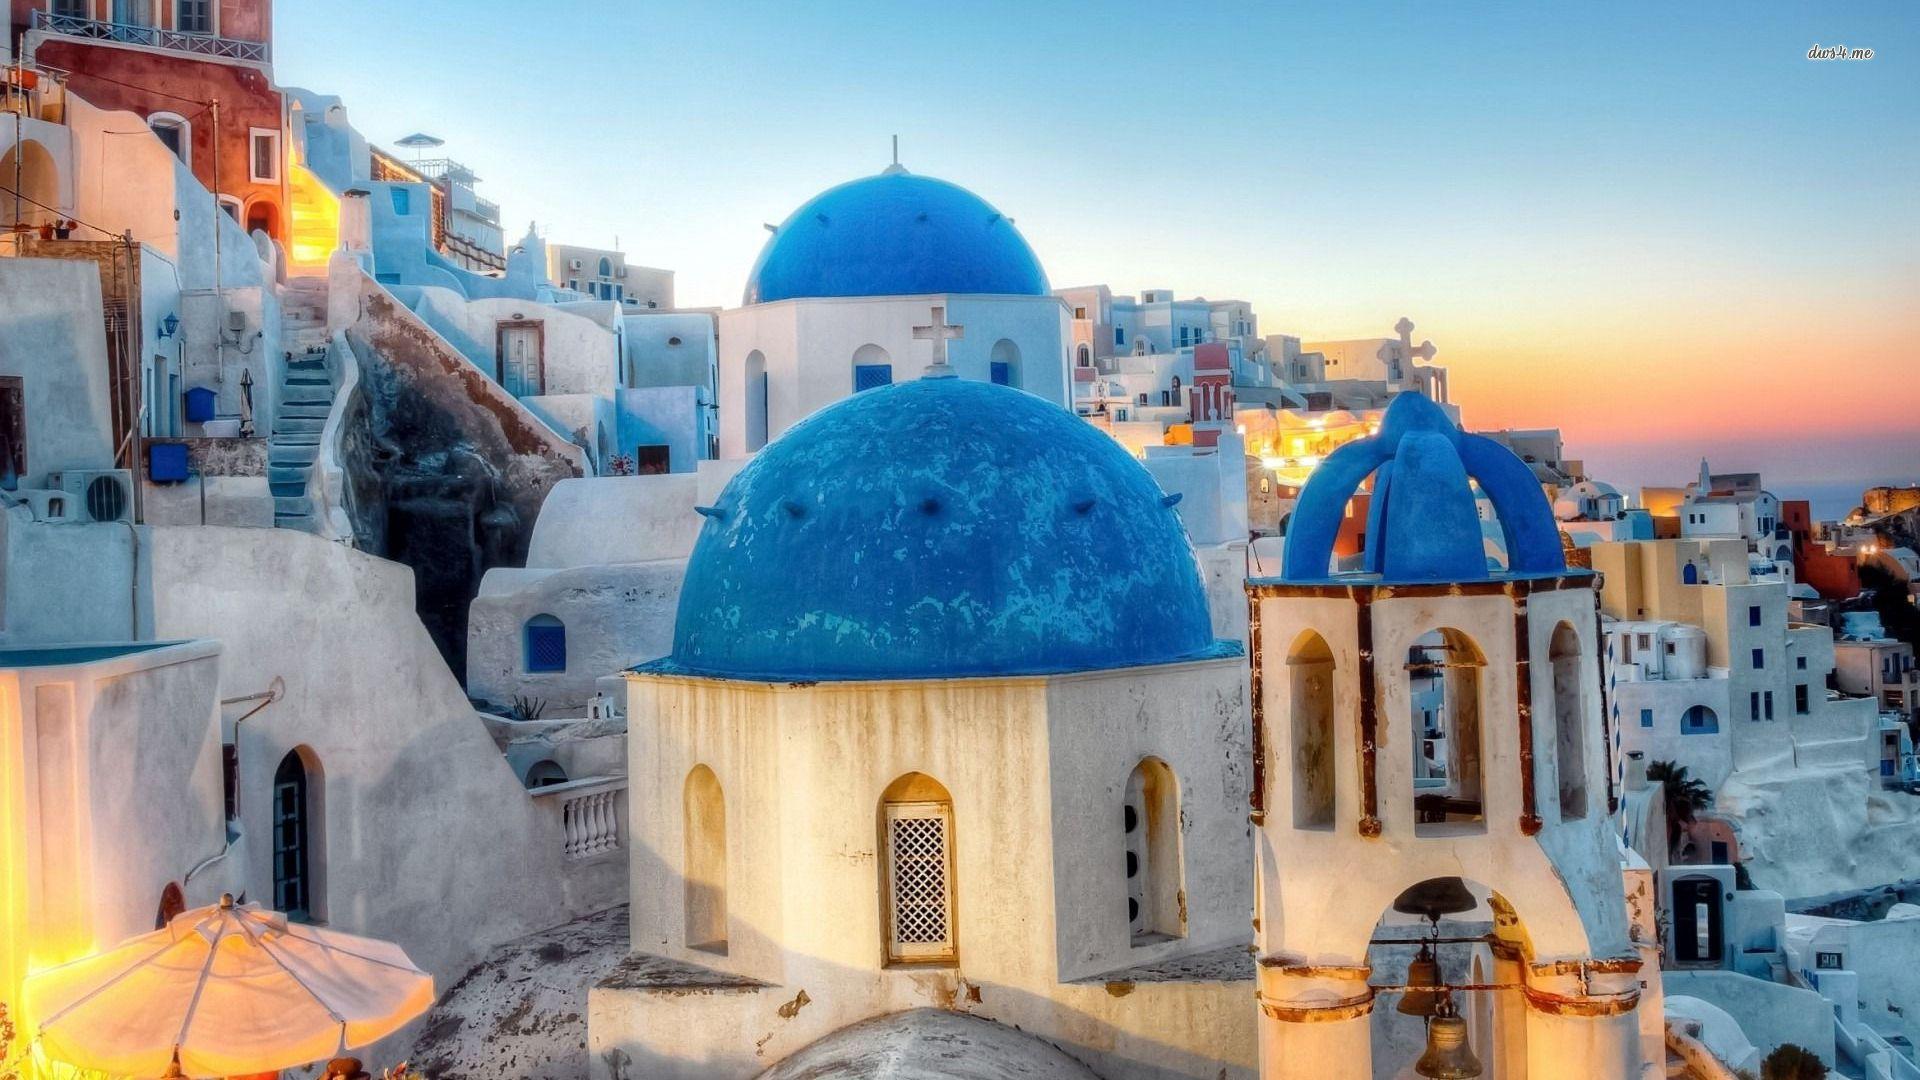 oia greece santorini wallpaper - photo #37